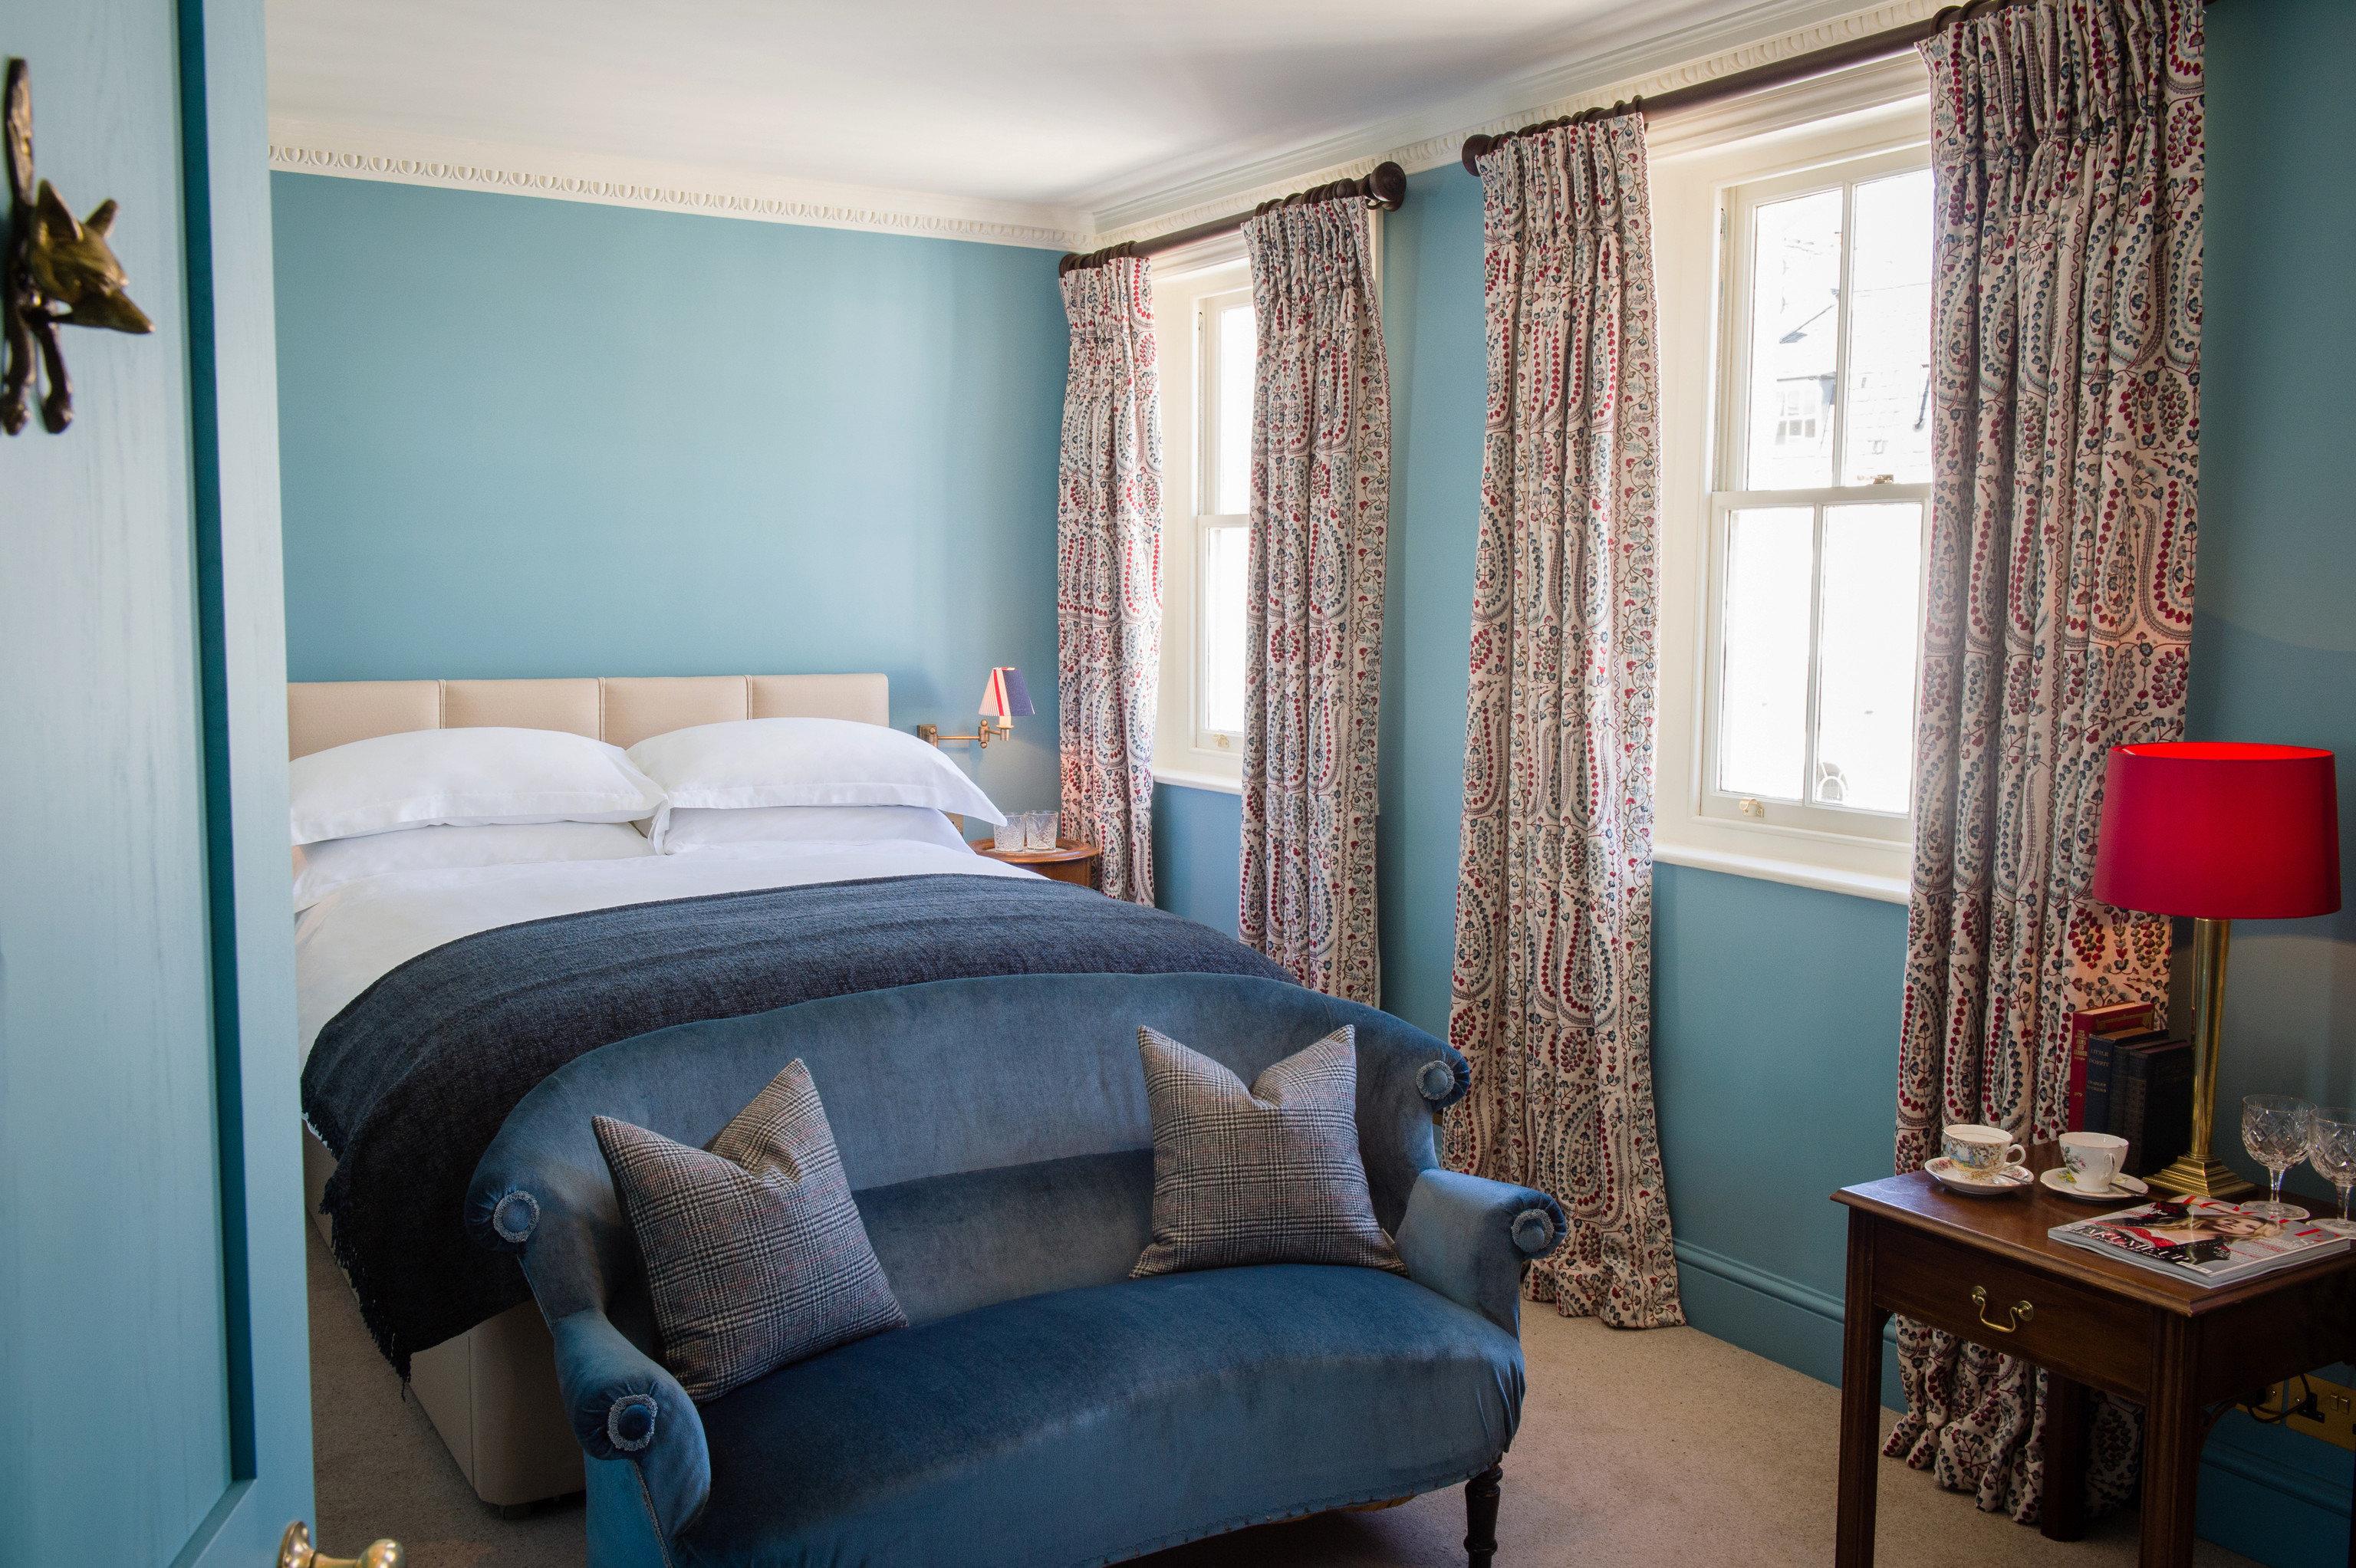 sofa property Bedroom living room home house cottage Suite blue